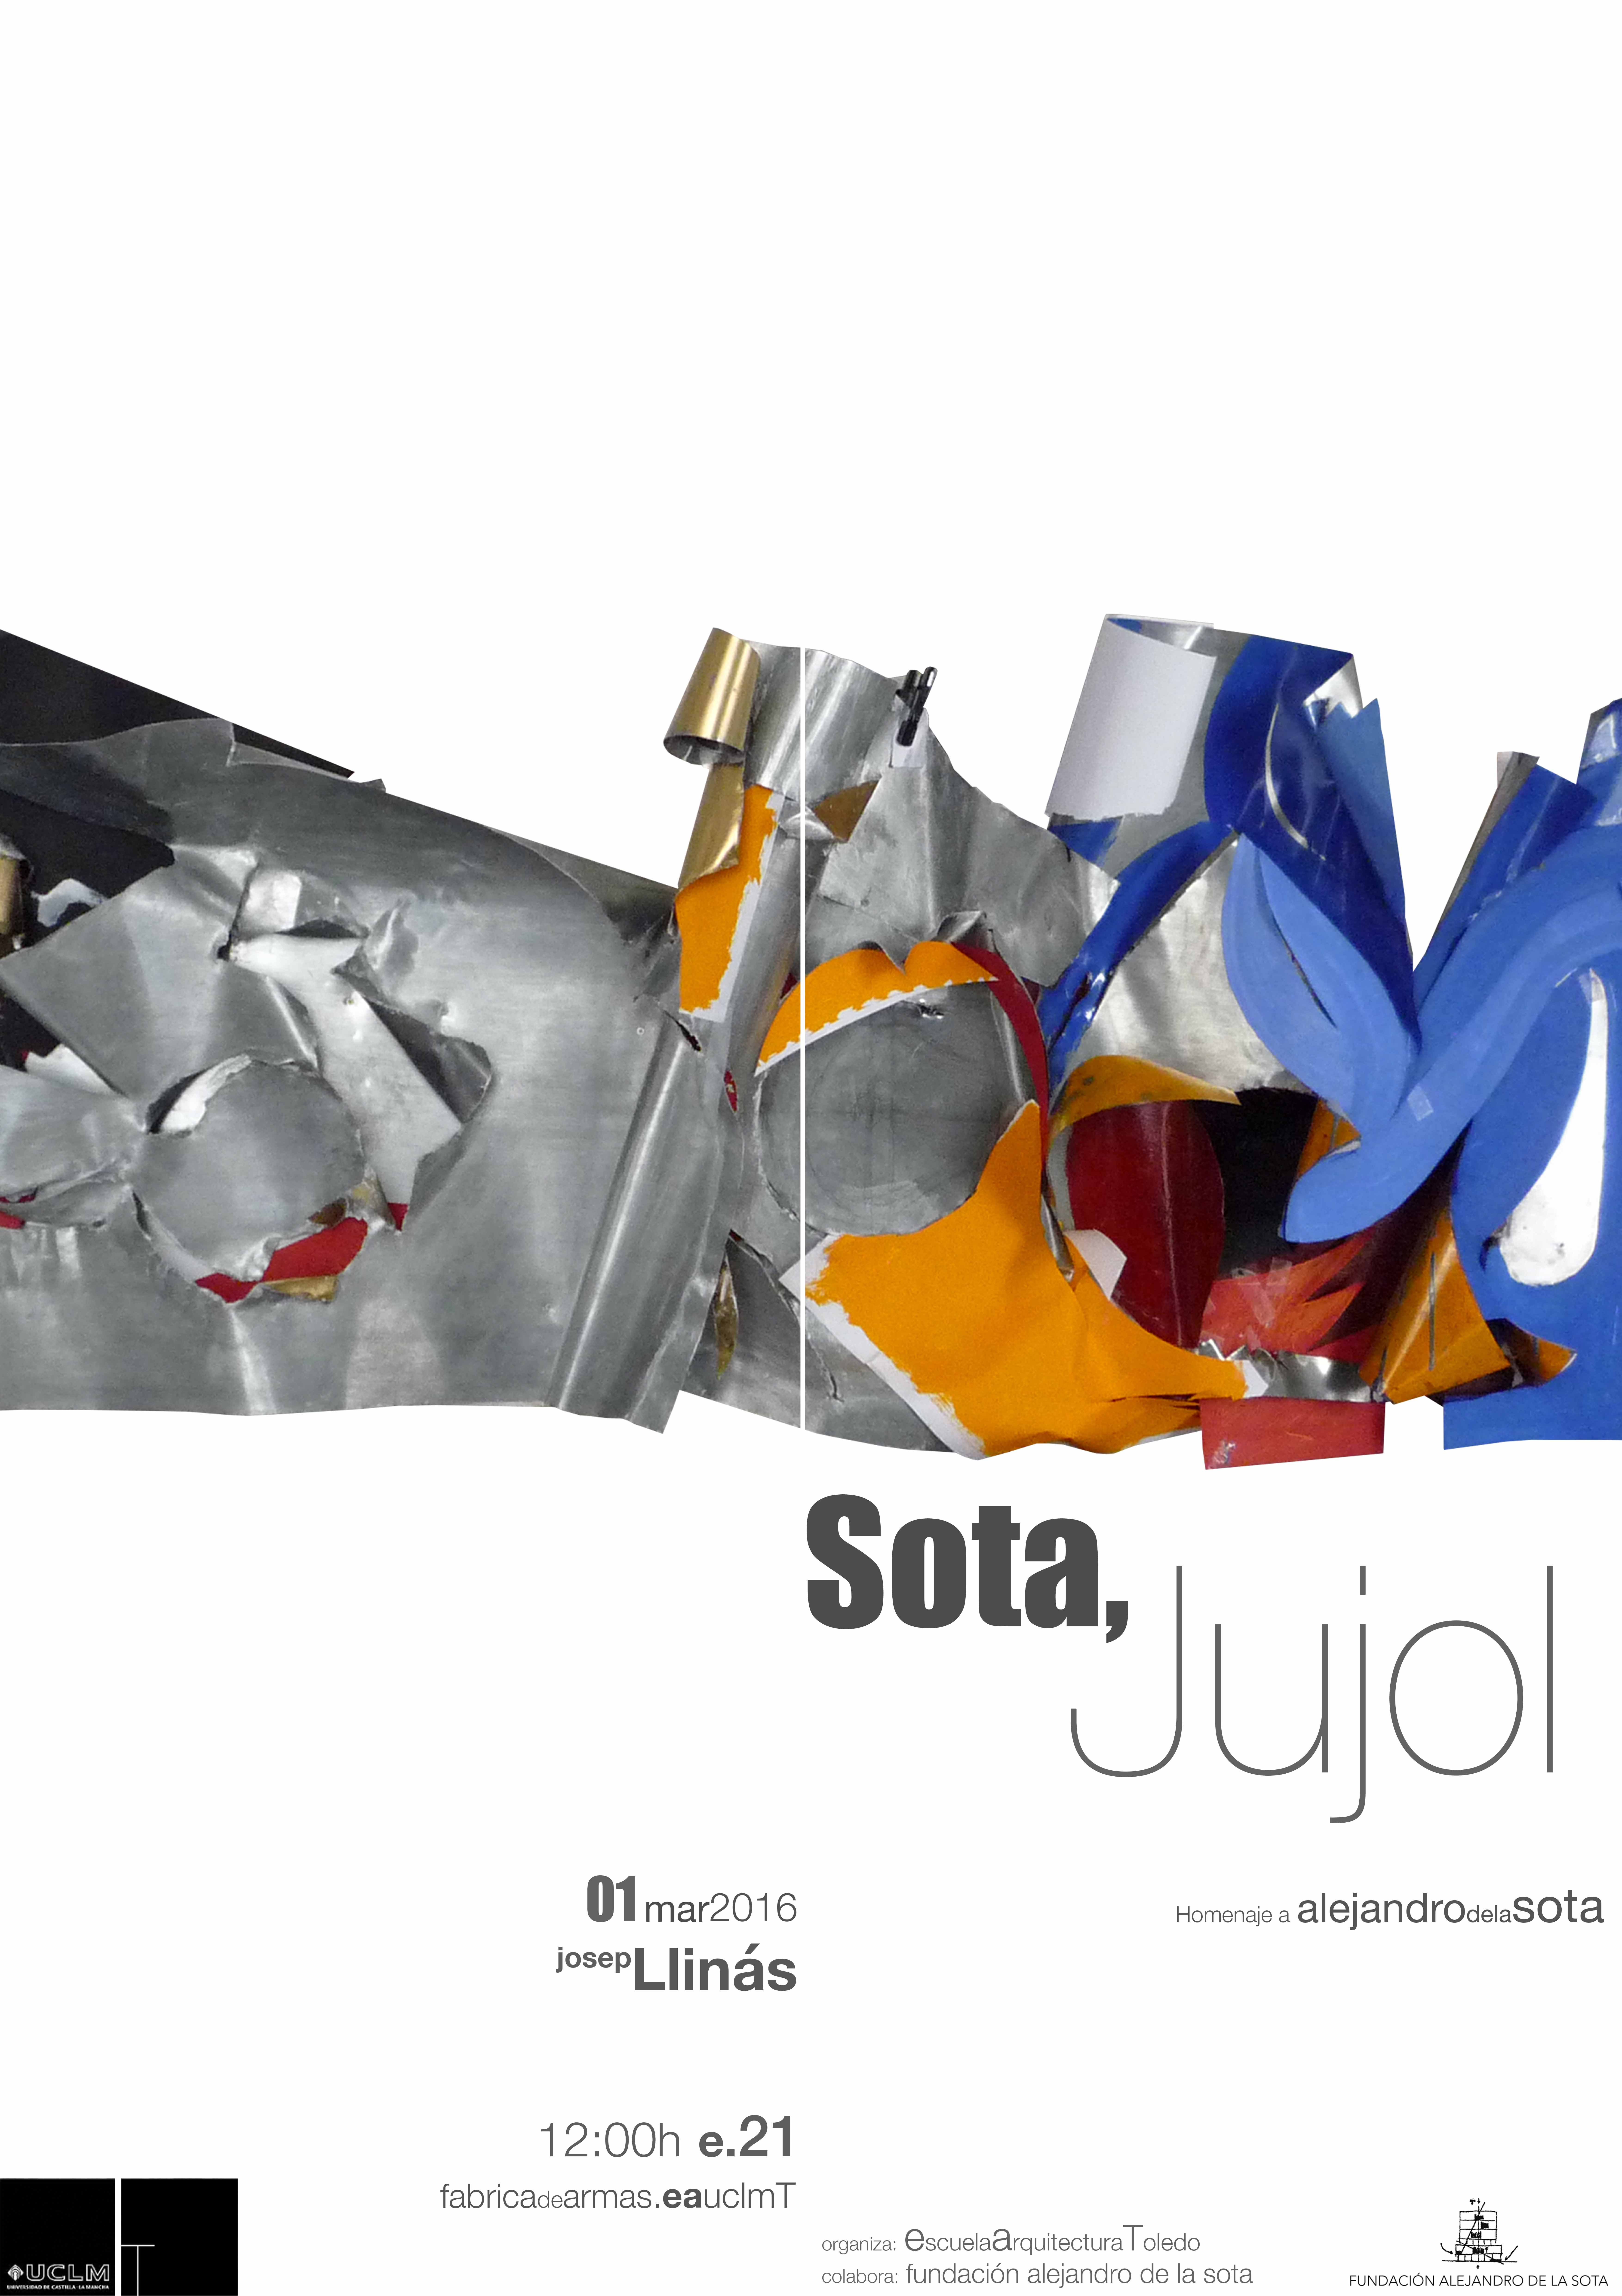 Sota,Jujol.Josep Llinas